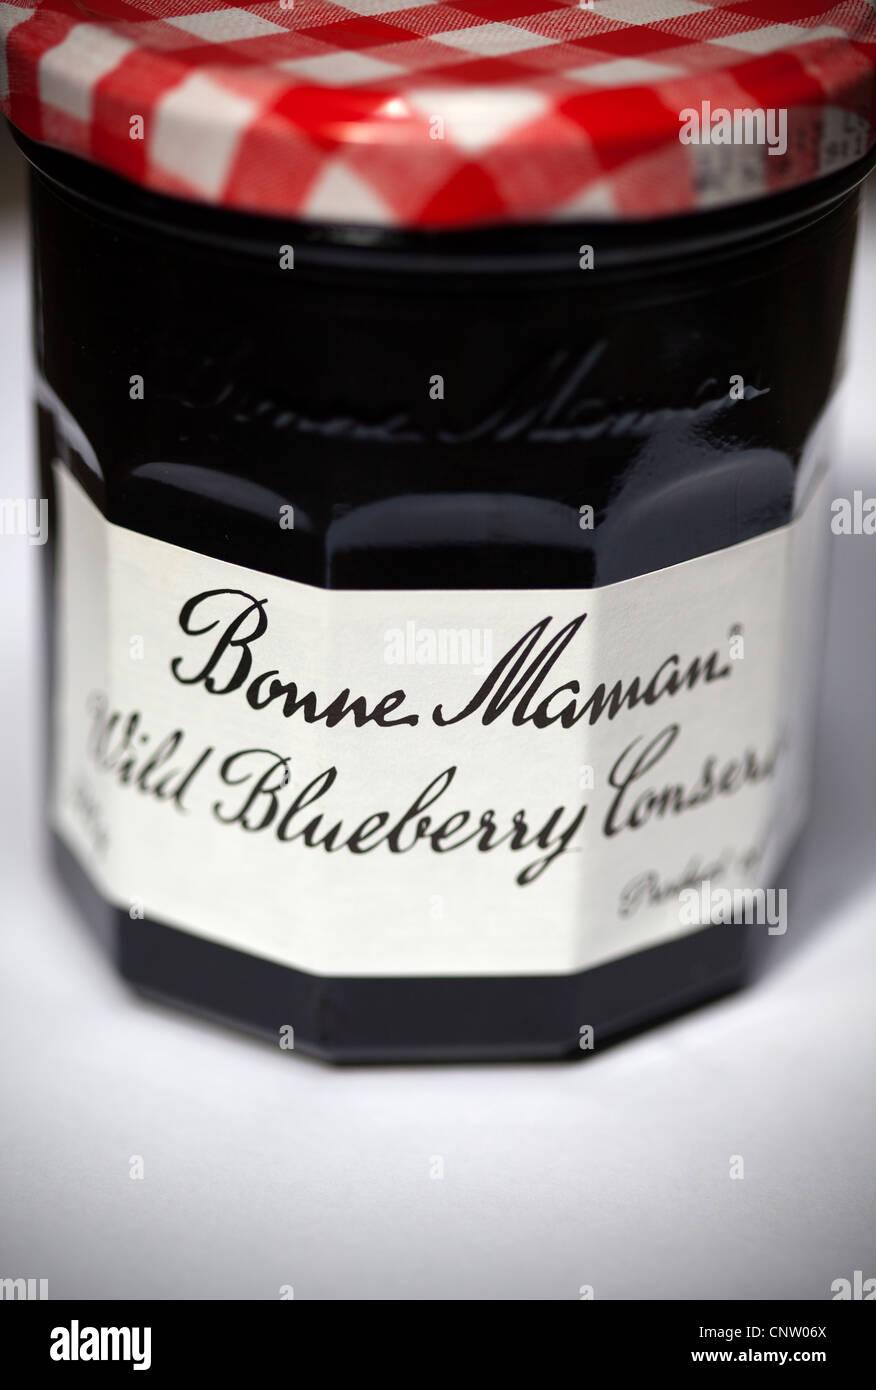 Bonne Maman Wild Blueberry  Conserve or Jam - Stock Image